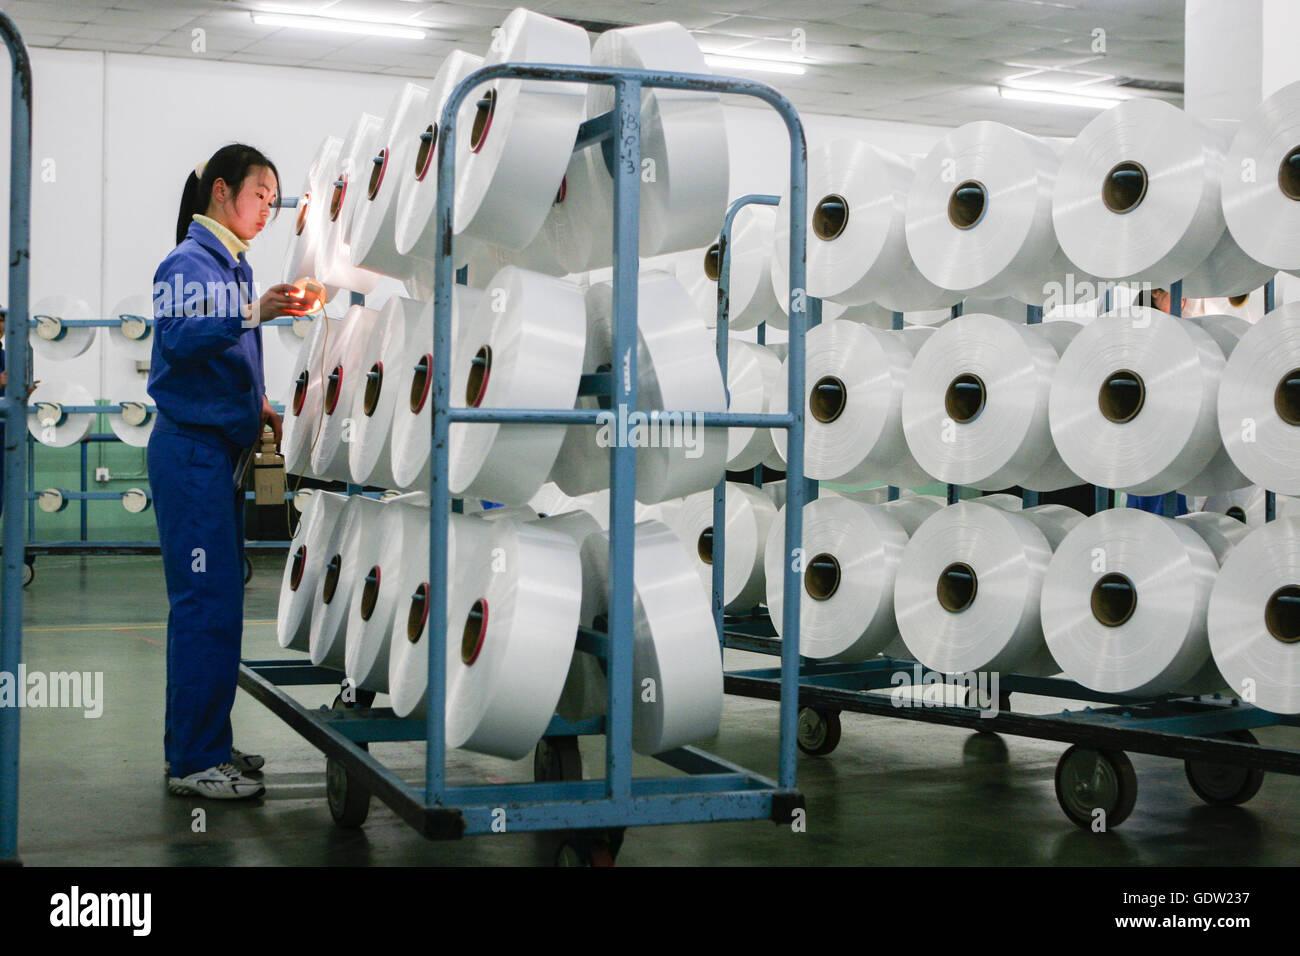 Chemical Fibre Stock Photos & Chemical Fibre Stock Images